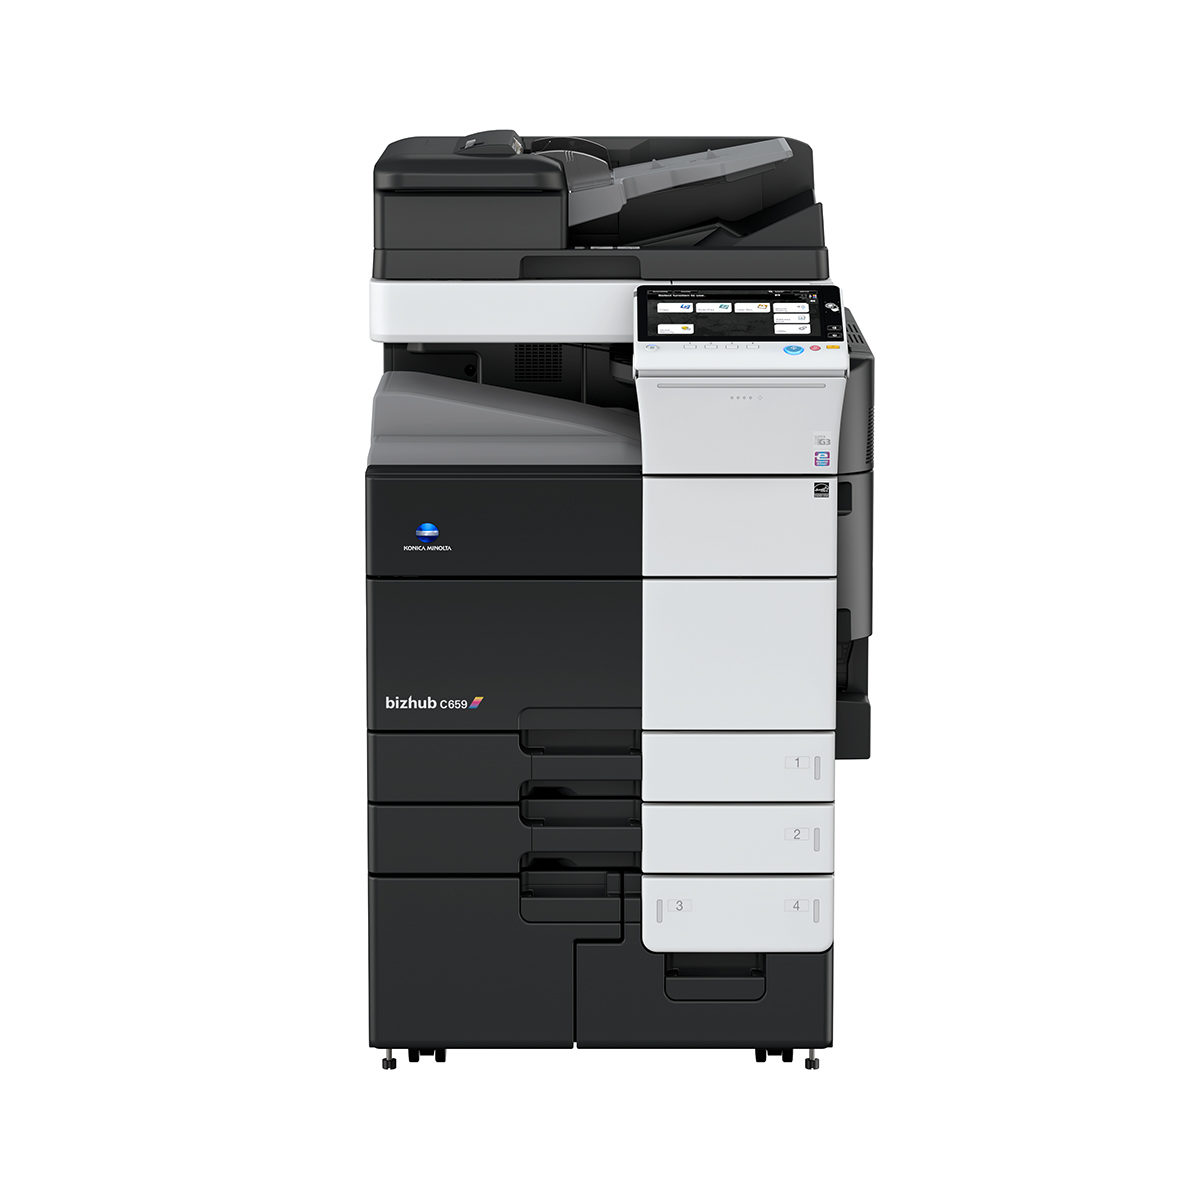 konica minolta bizhub c659 multifunction color copier 13